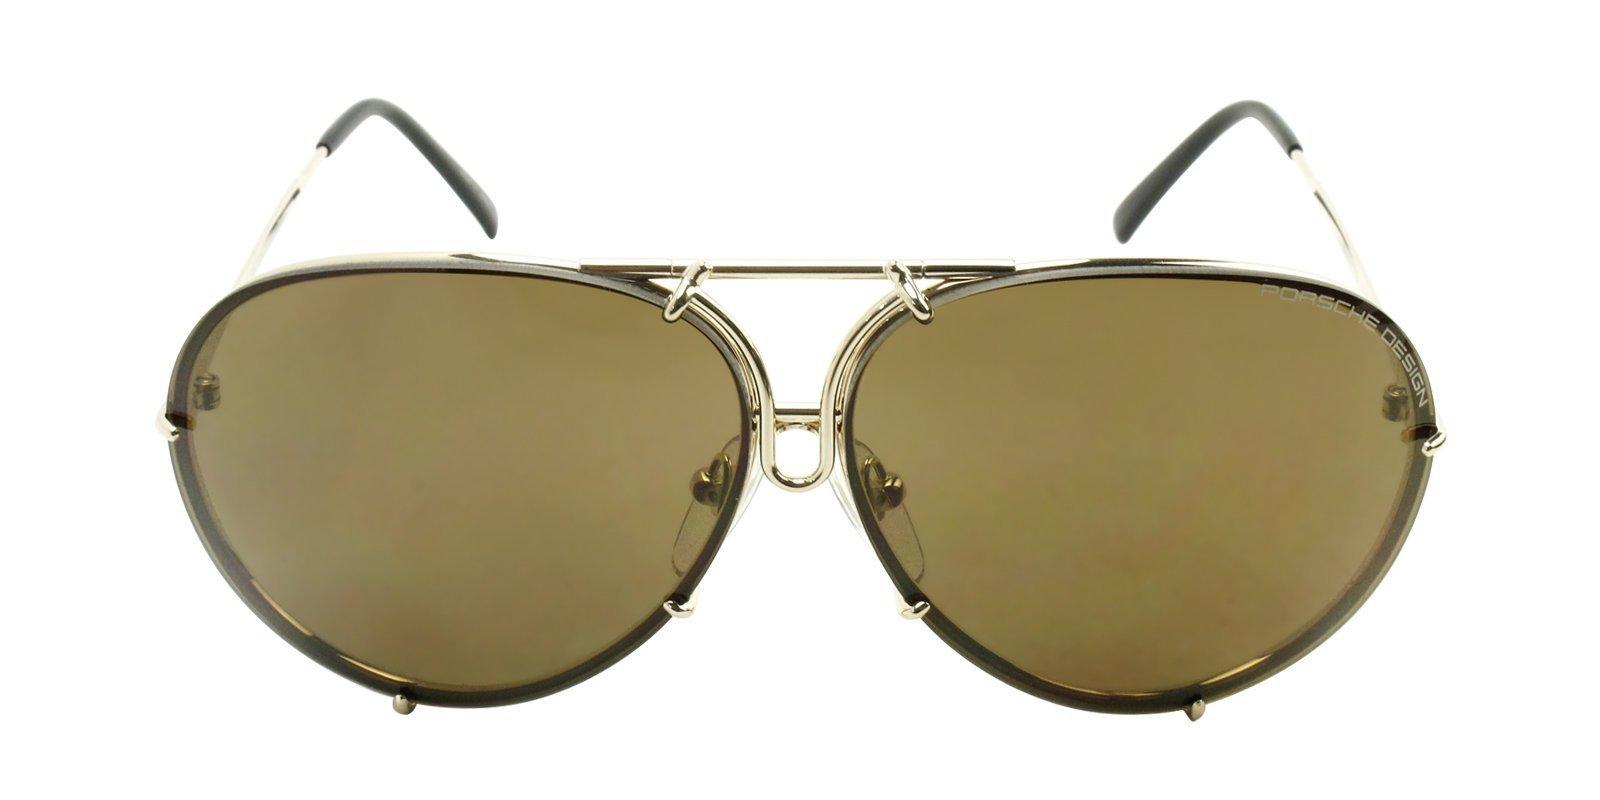 a48439fc03b Porsche Design - P8478 Gold - Brown sunglasses